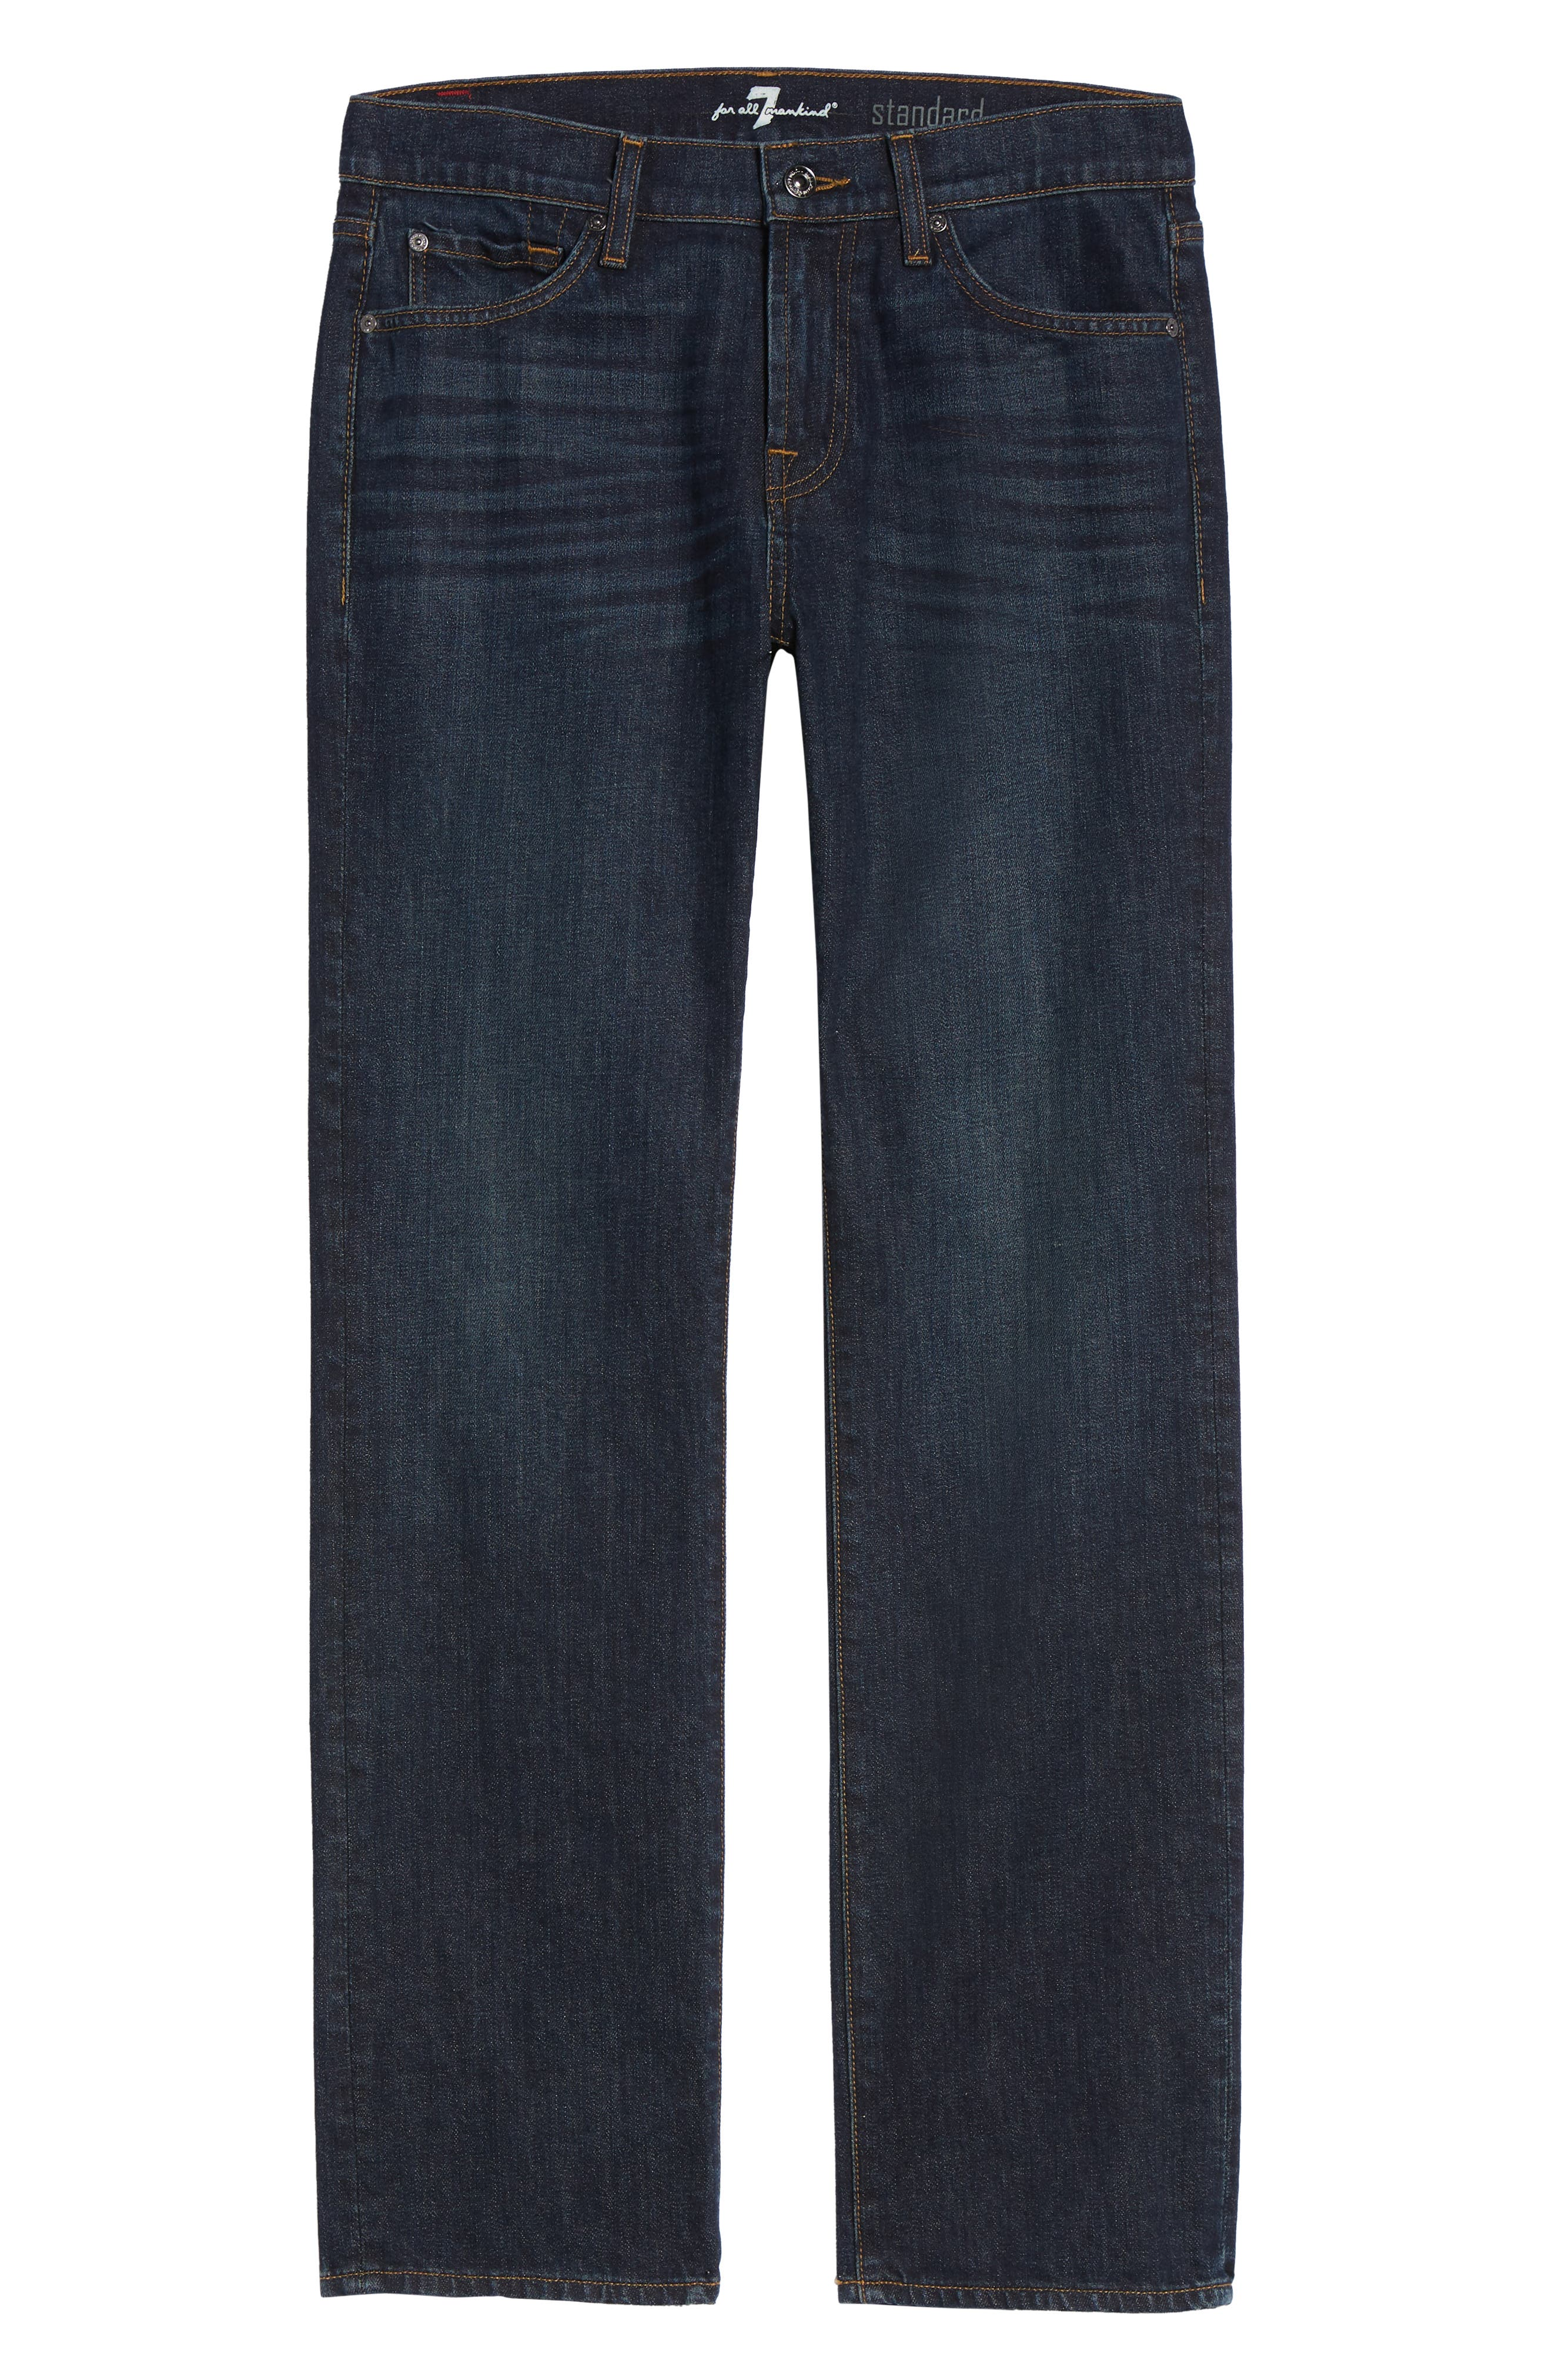 Standard Straight Leg Jeans,                             Alternate thumbnail 7, color,                             ABERDEEN